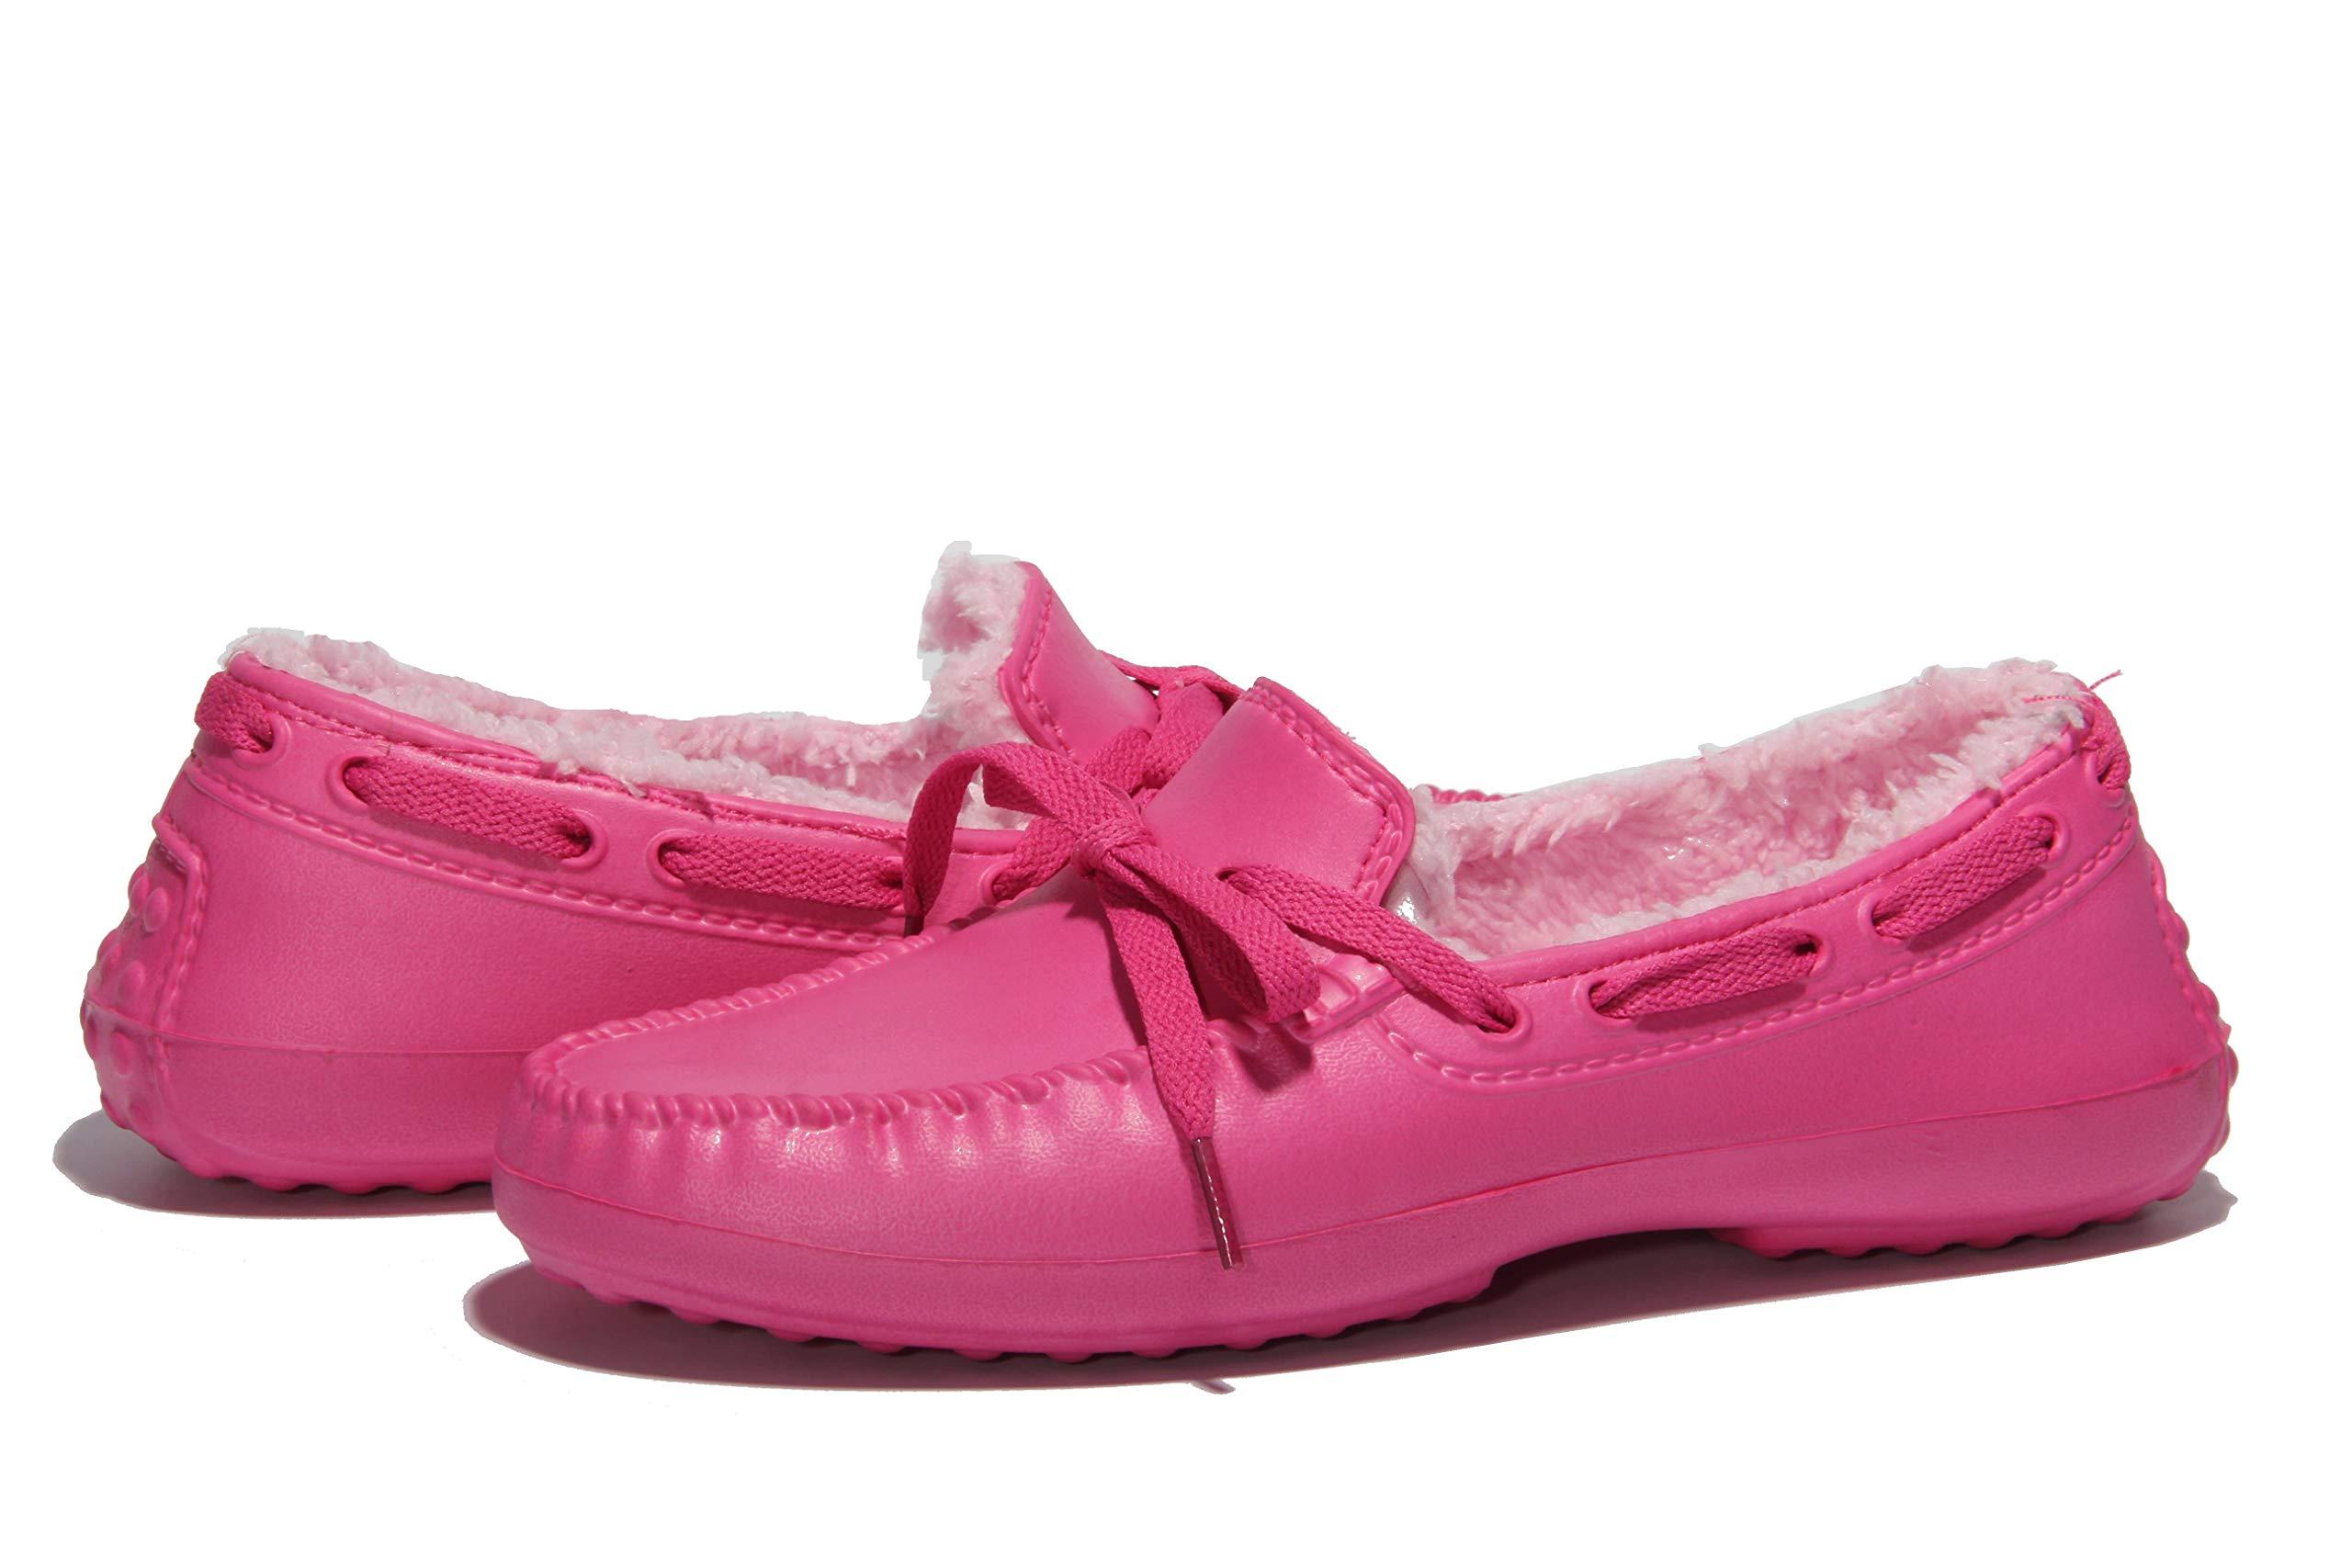 Women's Warm Comfy Velvet Memory Foam Ballerina Slippers Plush Shallow Peas Closed Back House Shoes Indoor Floor Footwear Red